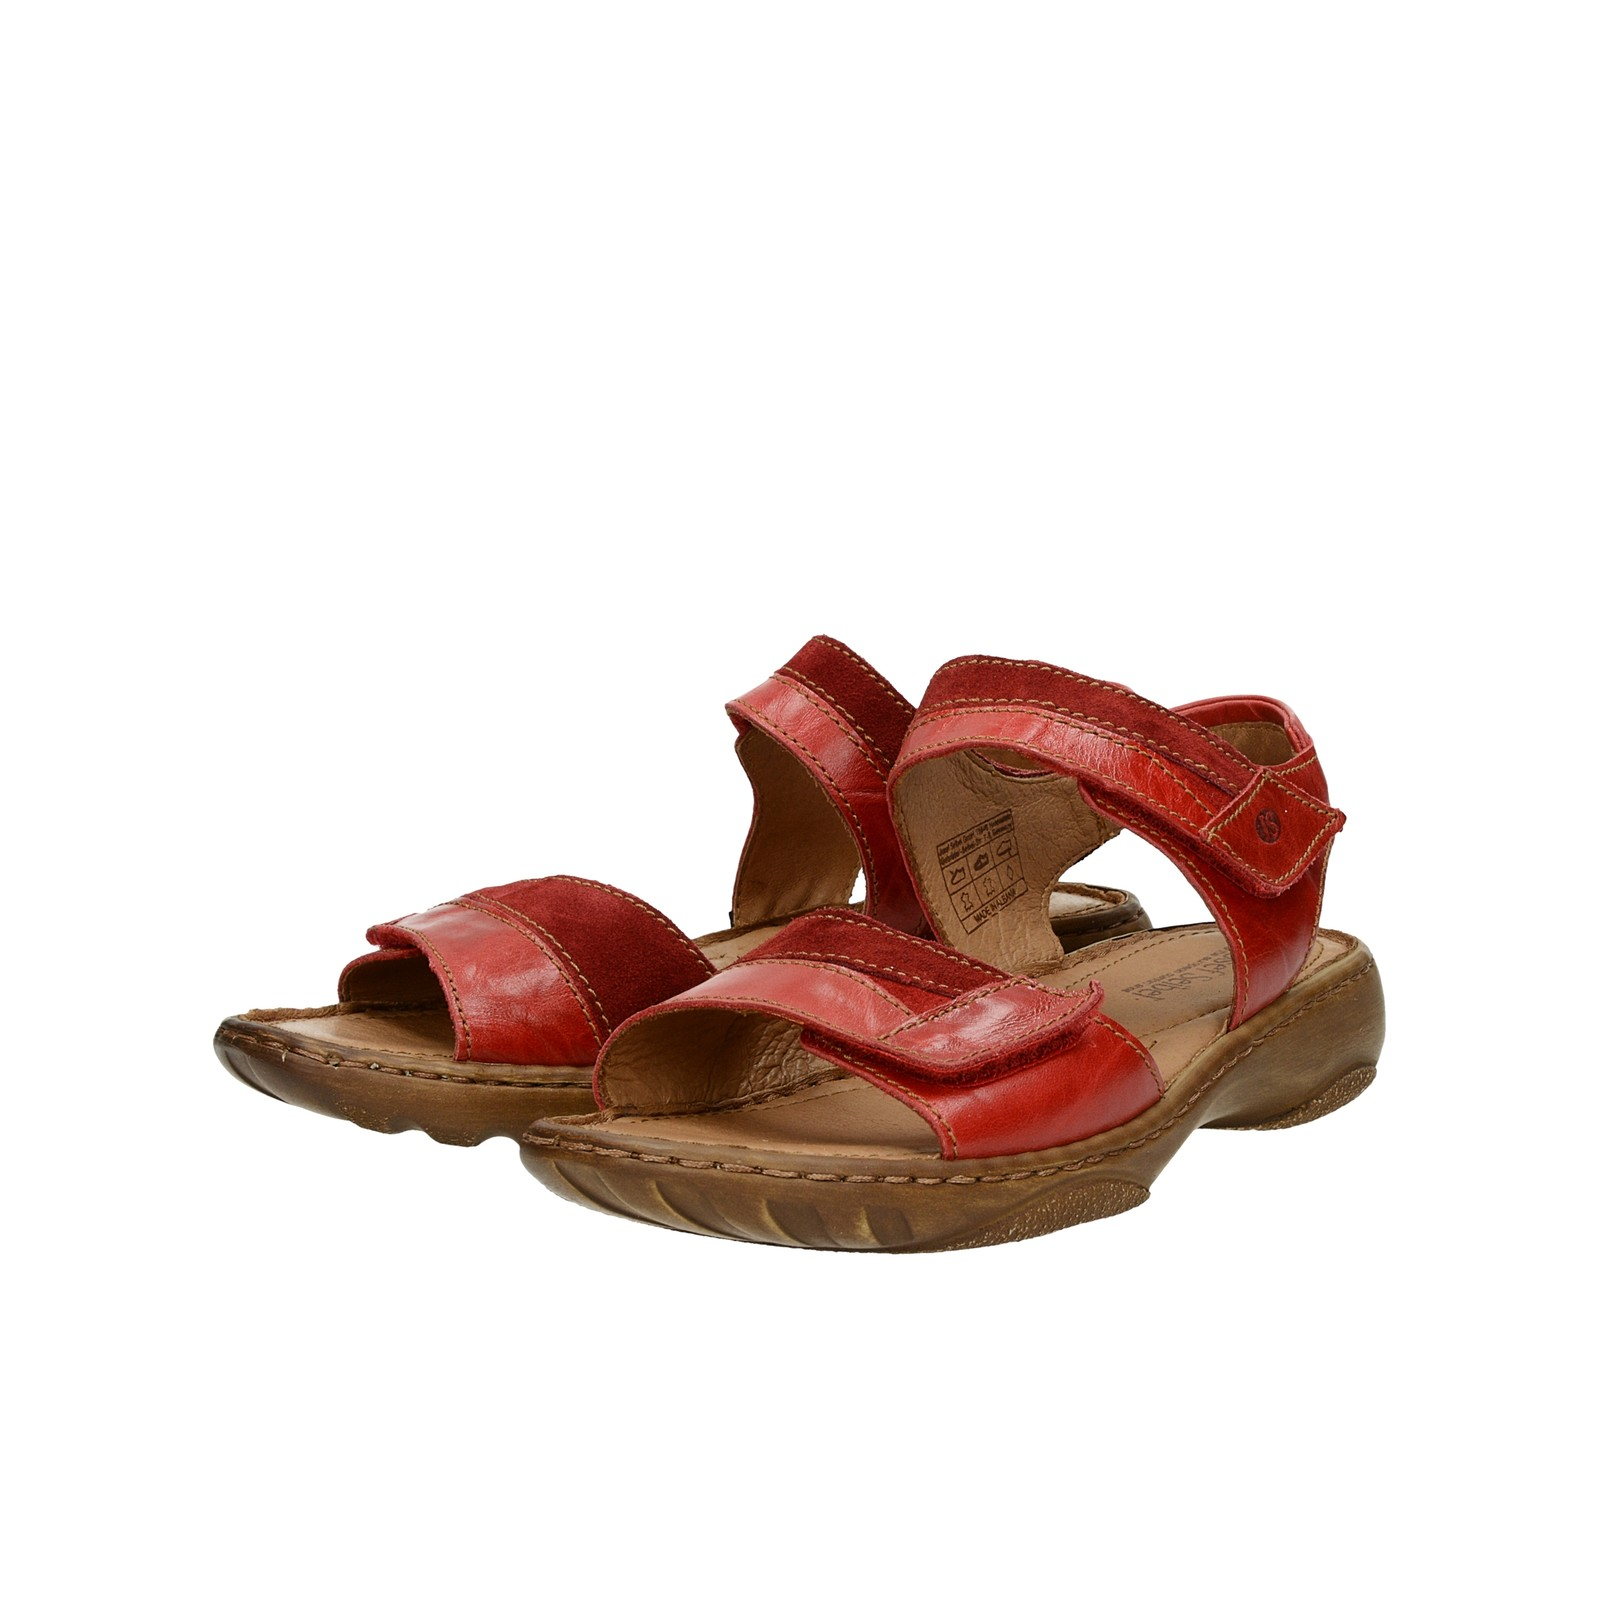 c44d5dc44eca ... Josef Seibel dámske kožené sandále - červené ...